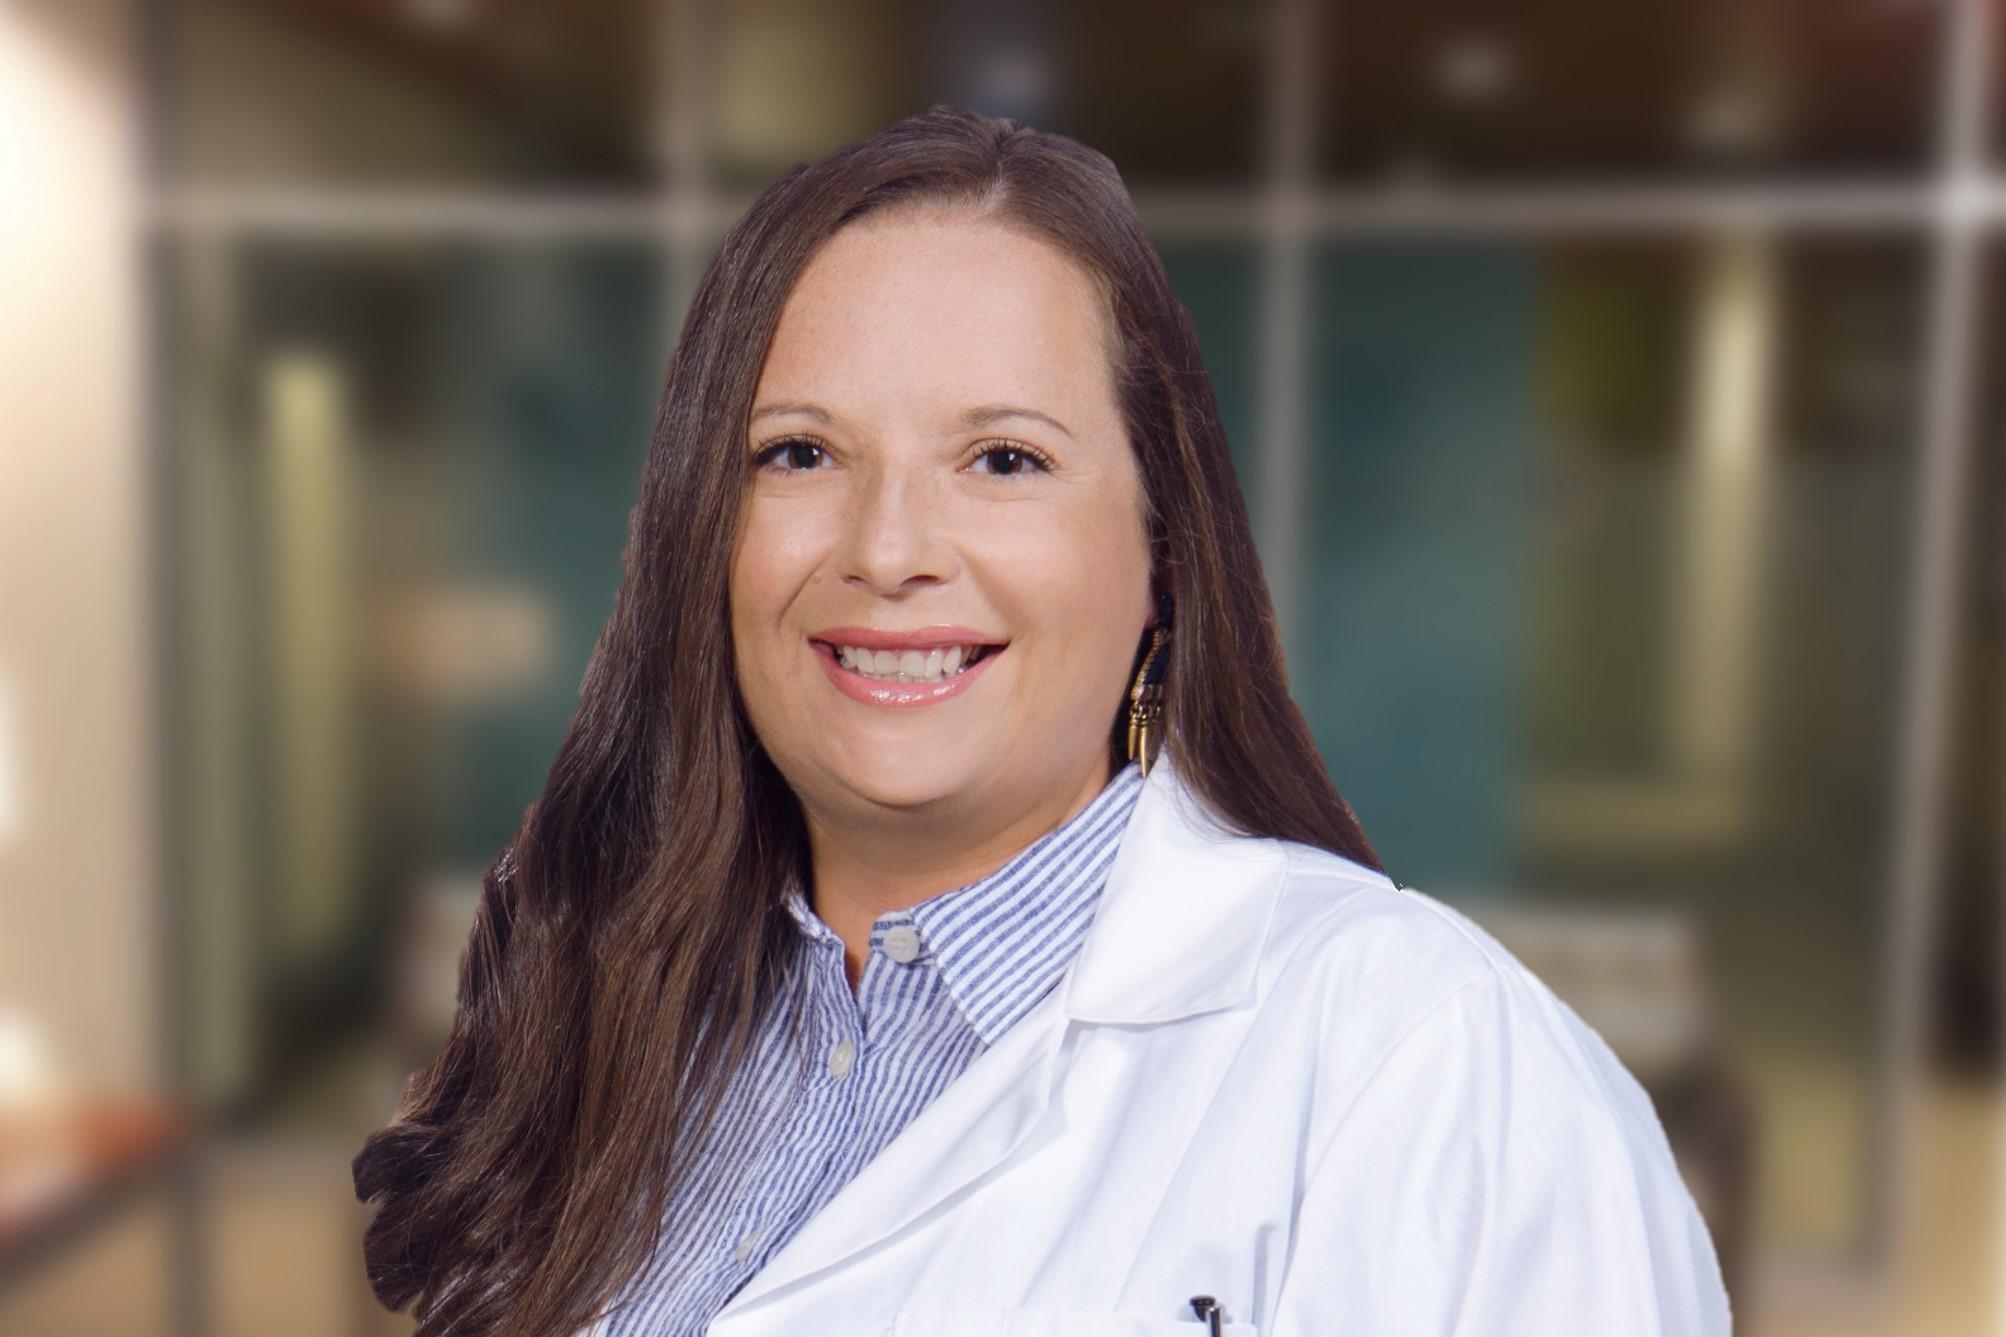 Dr. Victoria Solderitch, Concierge Doctor, Richmond, VA